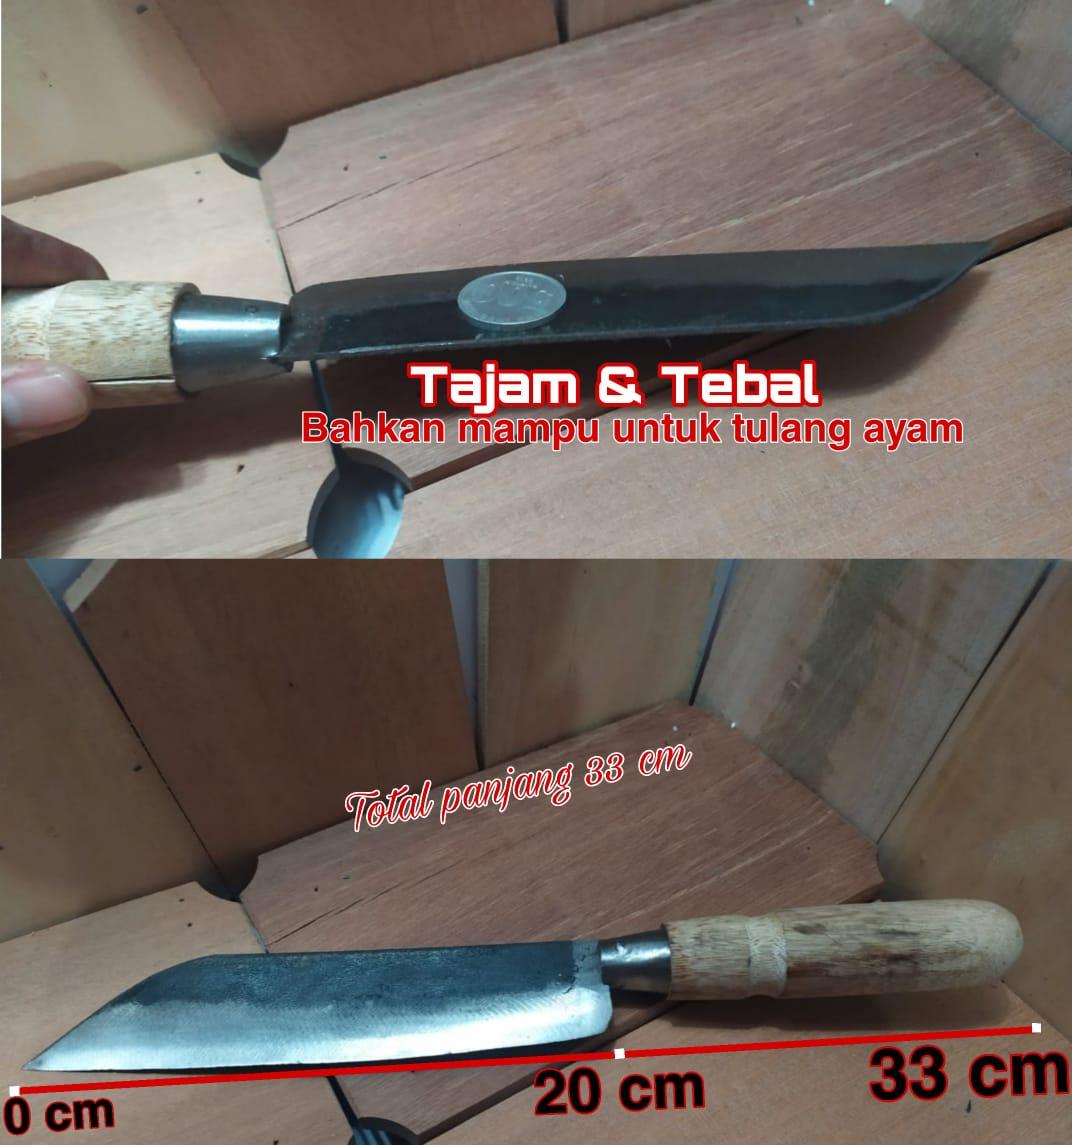 pisau baja tradisional pemotong daging cincang sayur tulang ayam kuat tajam bilah 19 cm gagang kayu